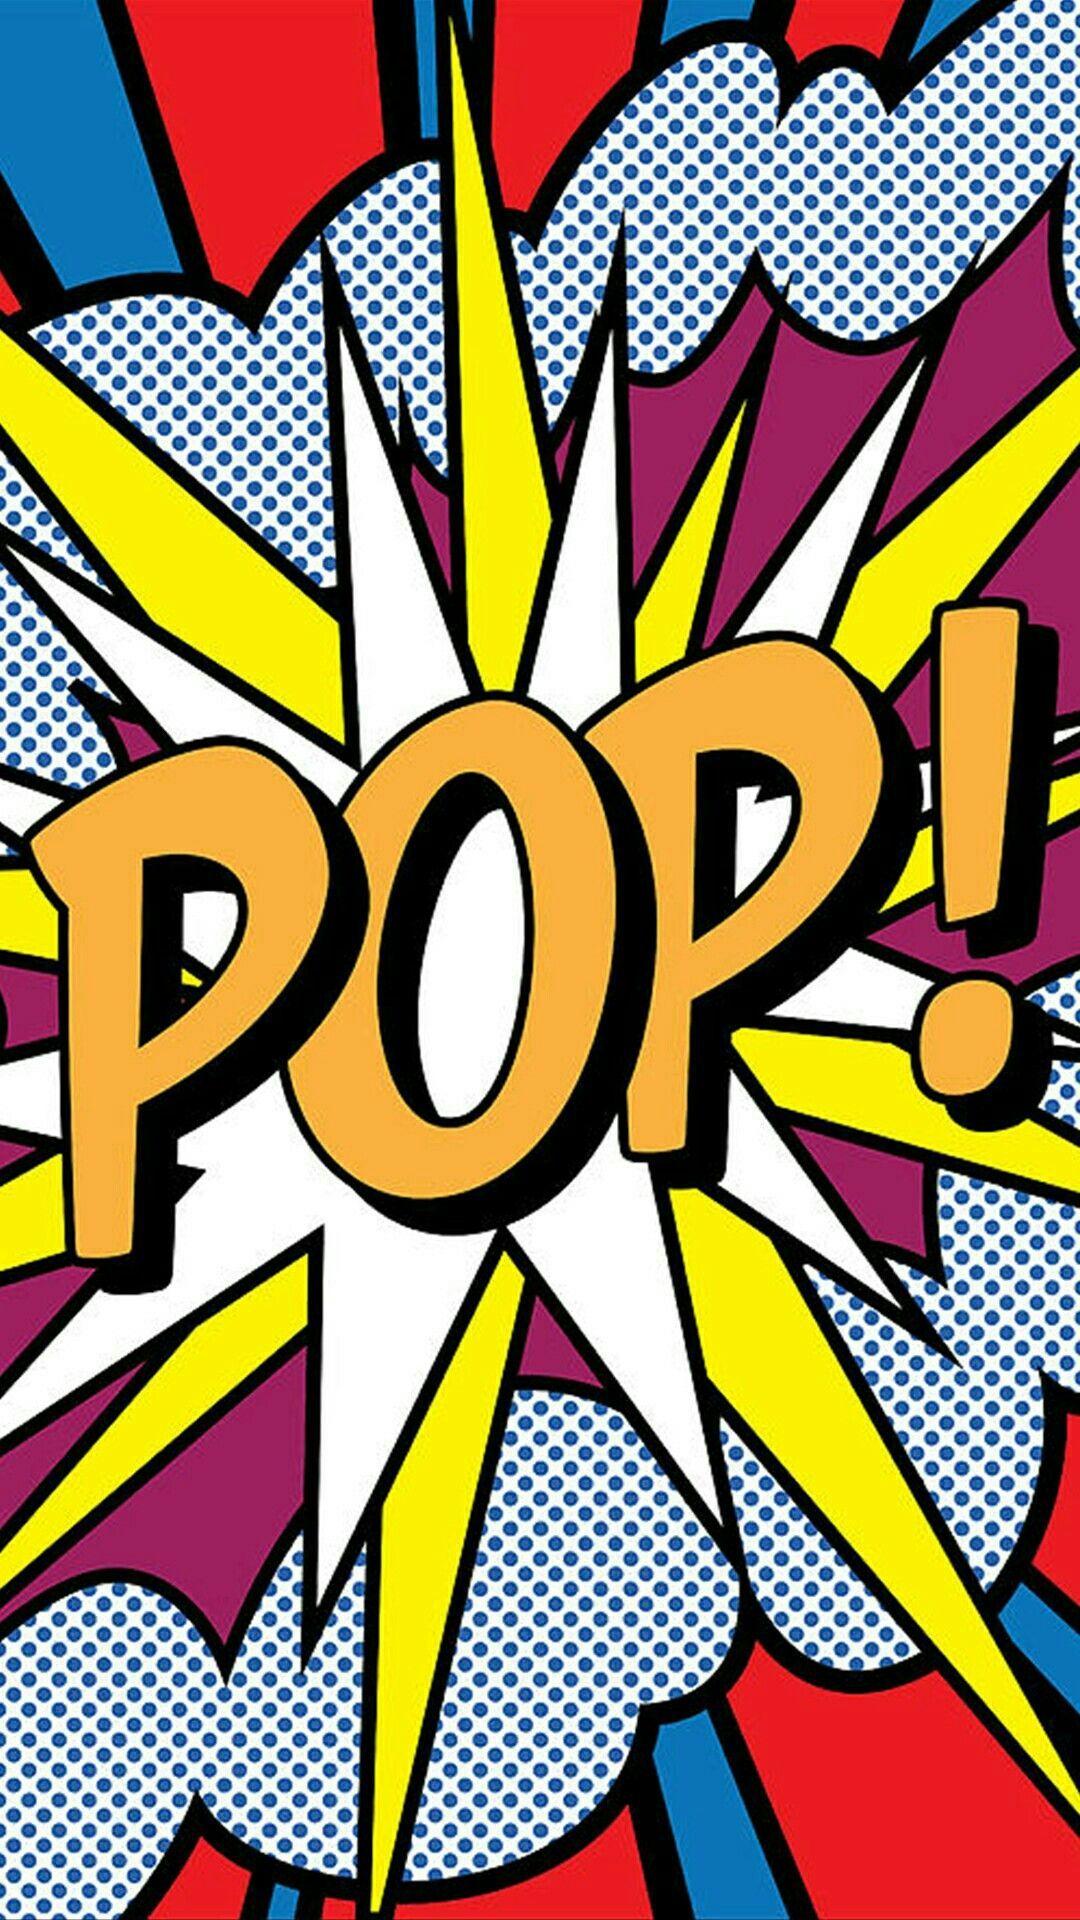 Pop Art Phone Wallpapers   Top Pop Art Phone Backgrounds 1080x1920